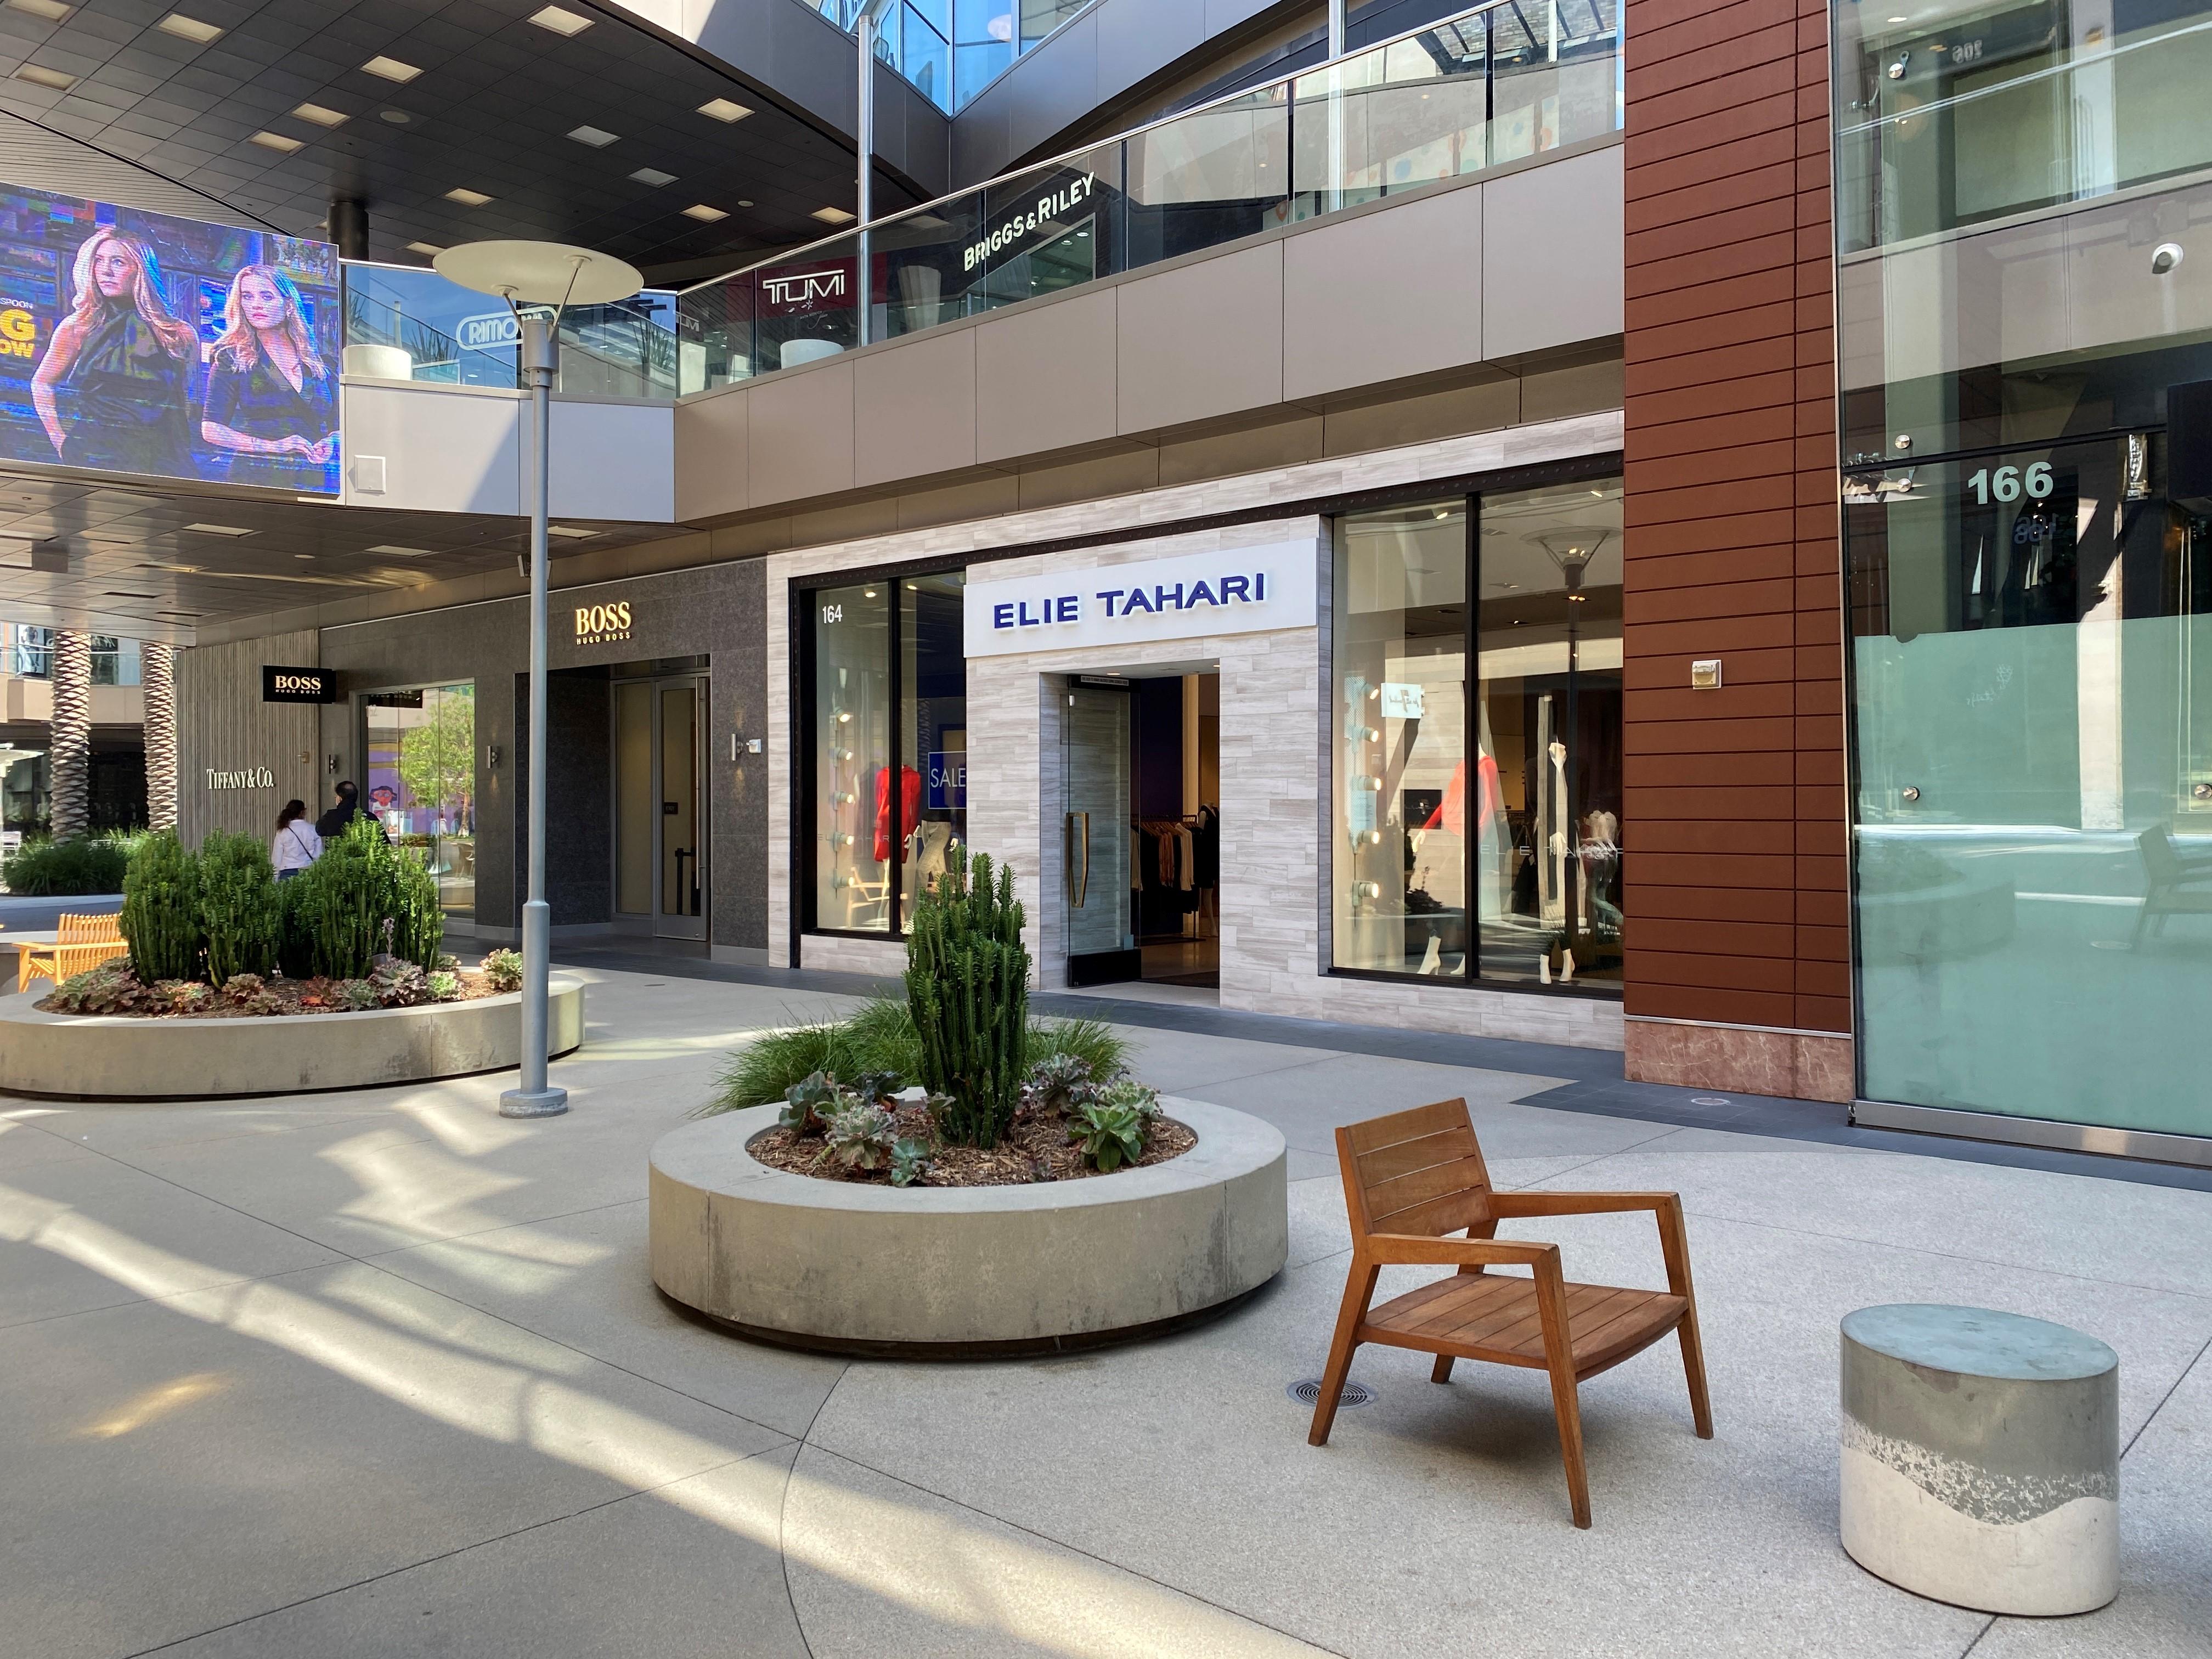 Elie Tahari Storefront